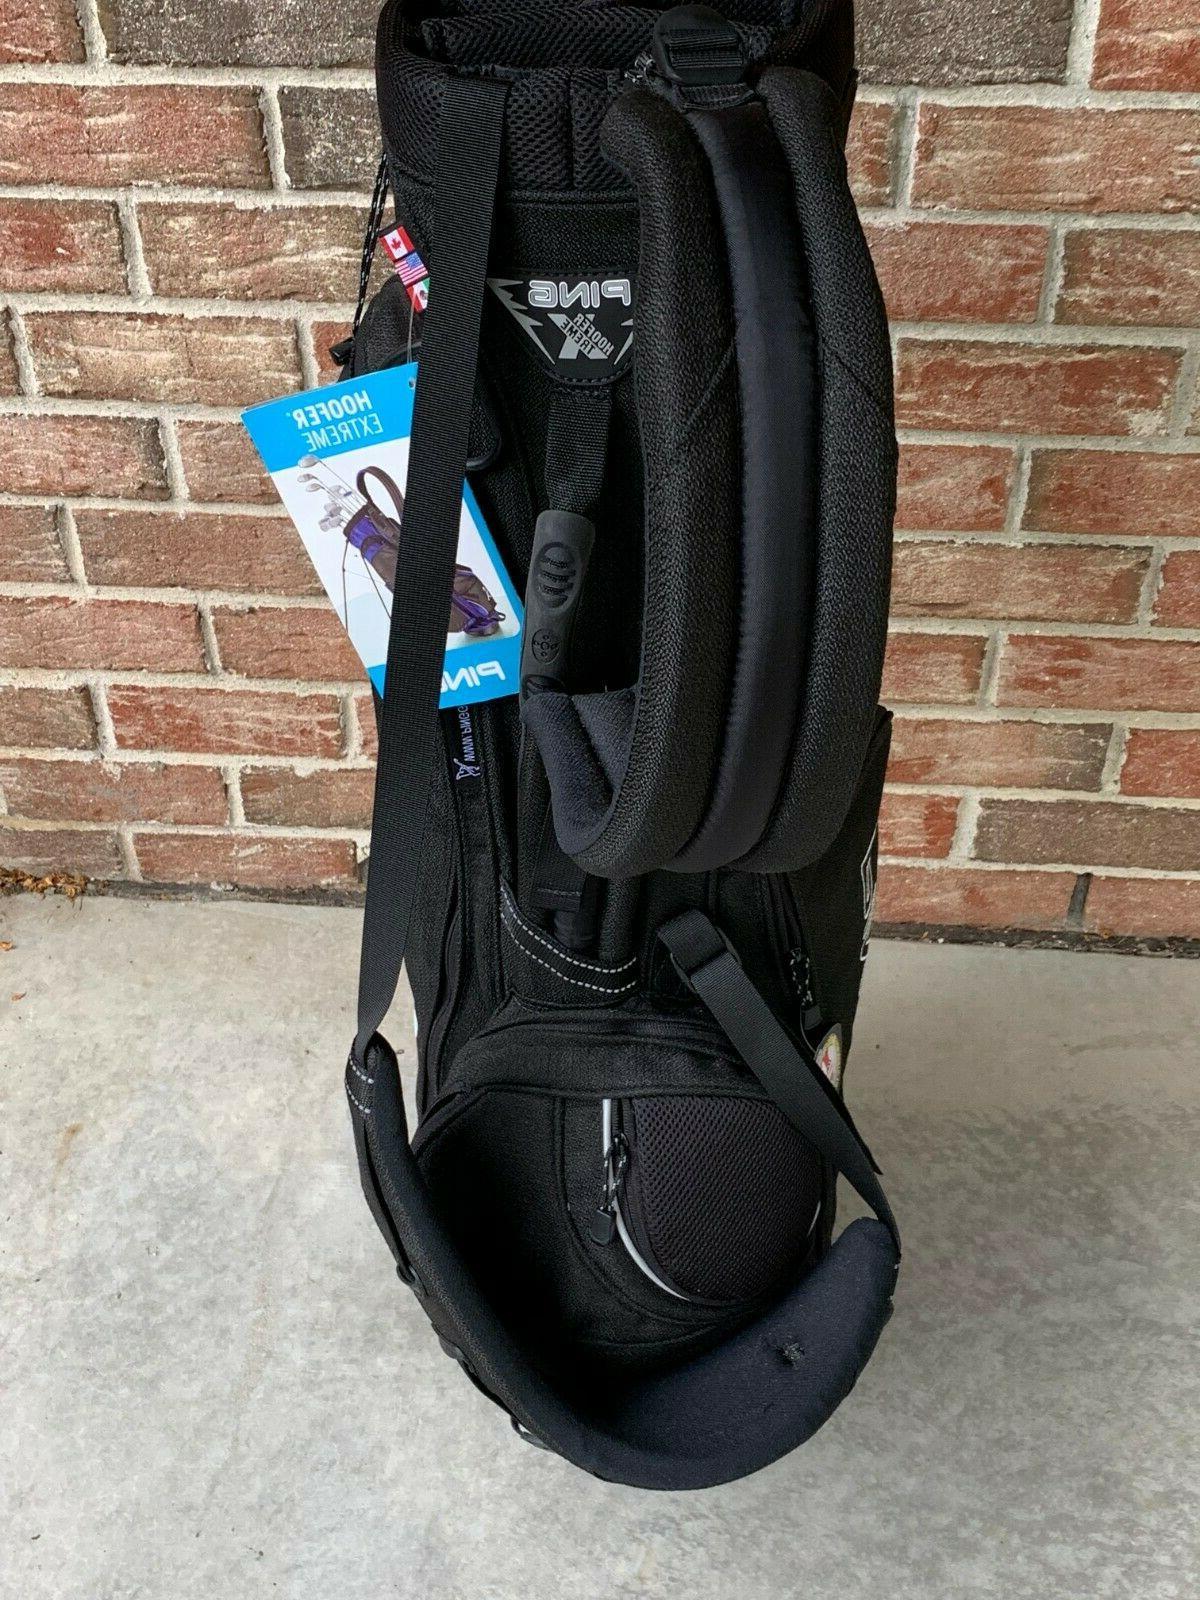 Ping Hoofer Carry Bag Brand